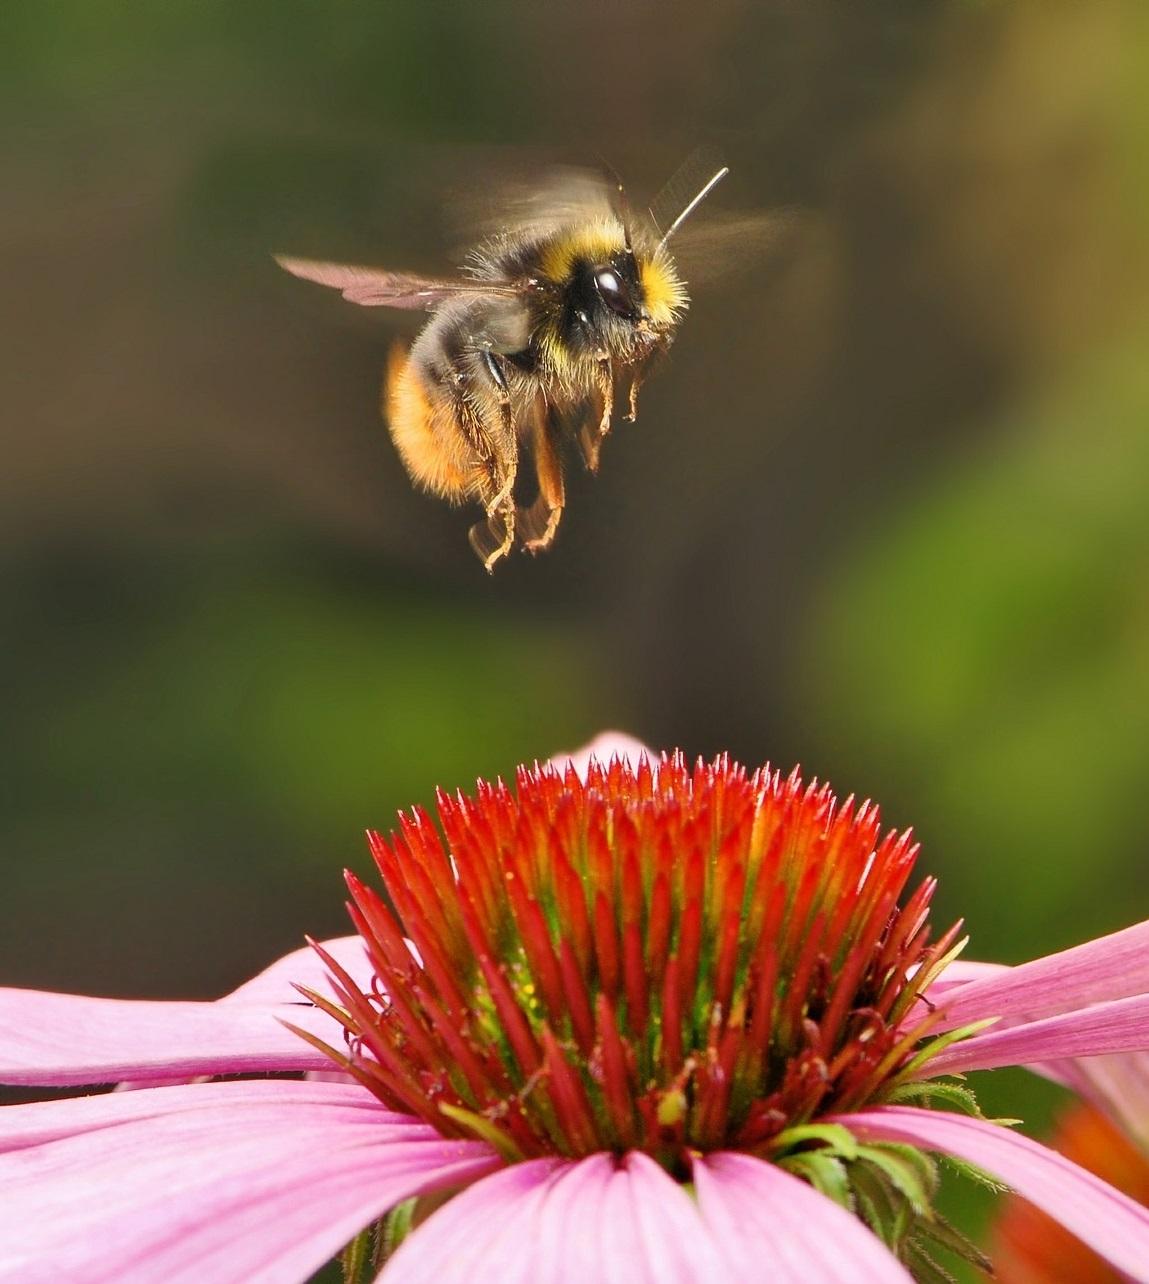 Attract Bees - Attract bumblebees - Bumblebee - Early Bumblebee